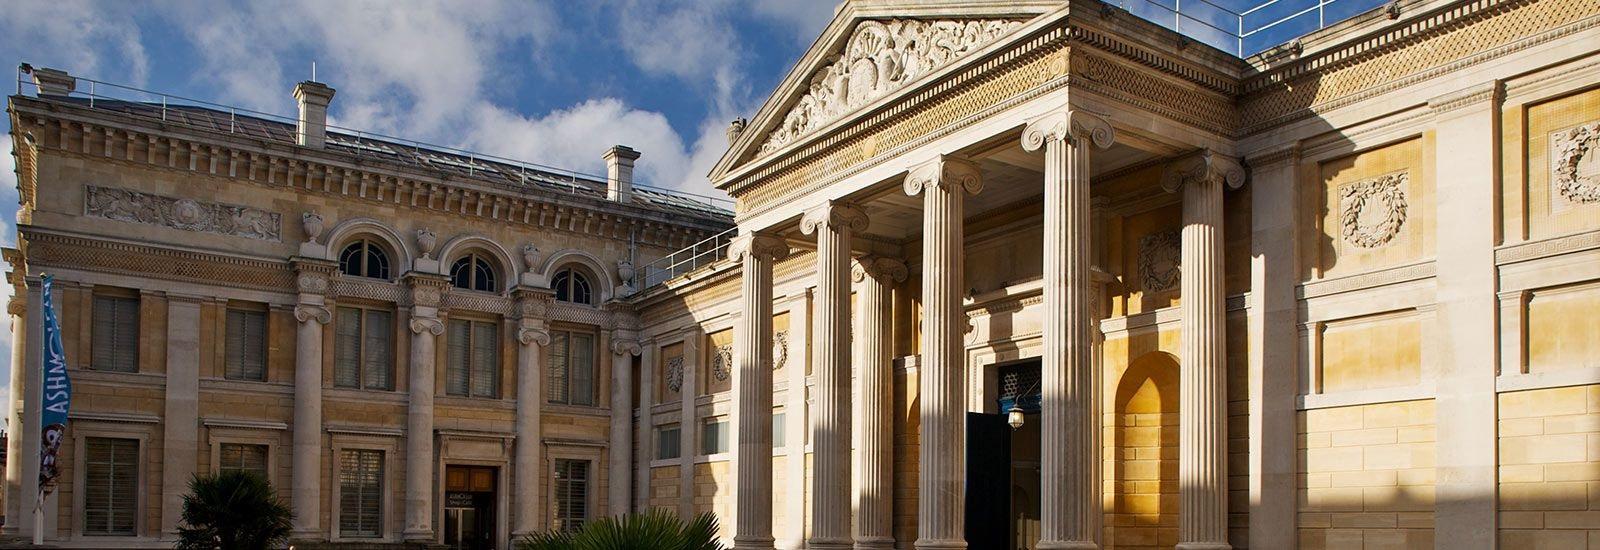 Oxford University - Panoramic